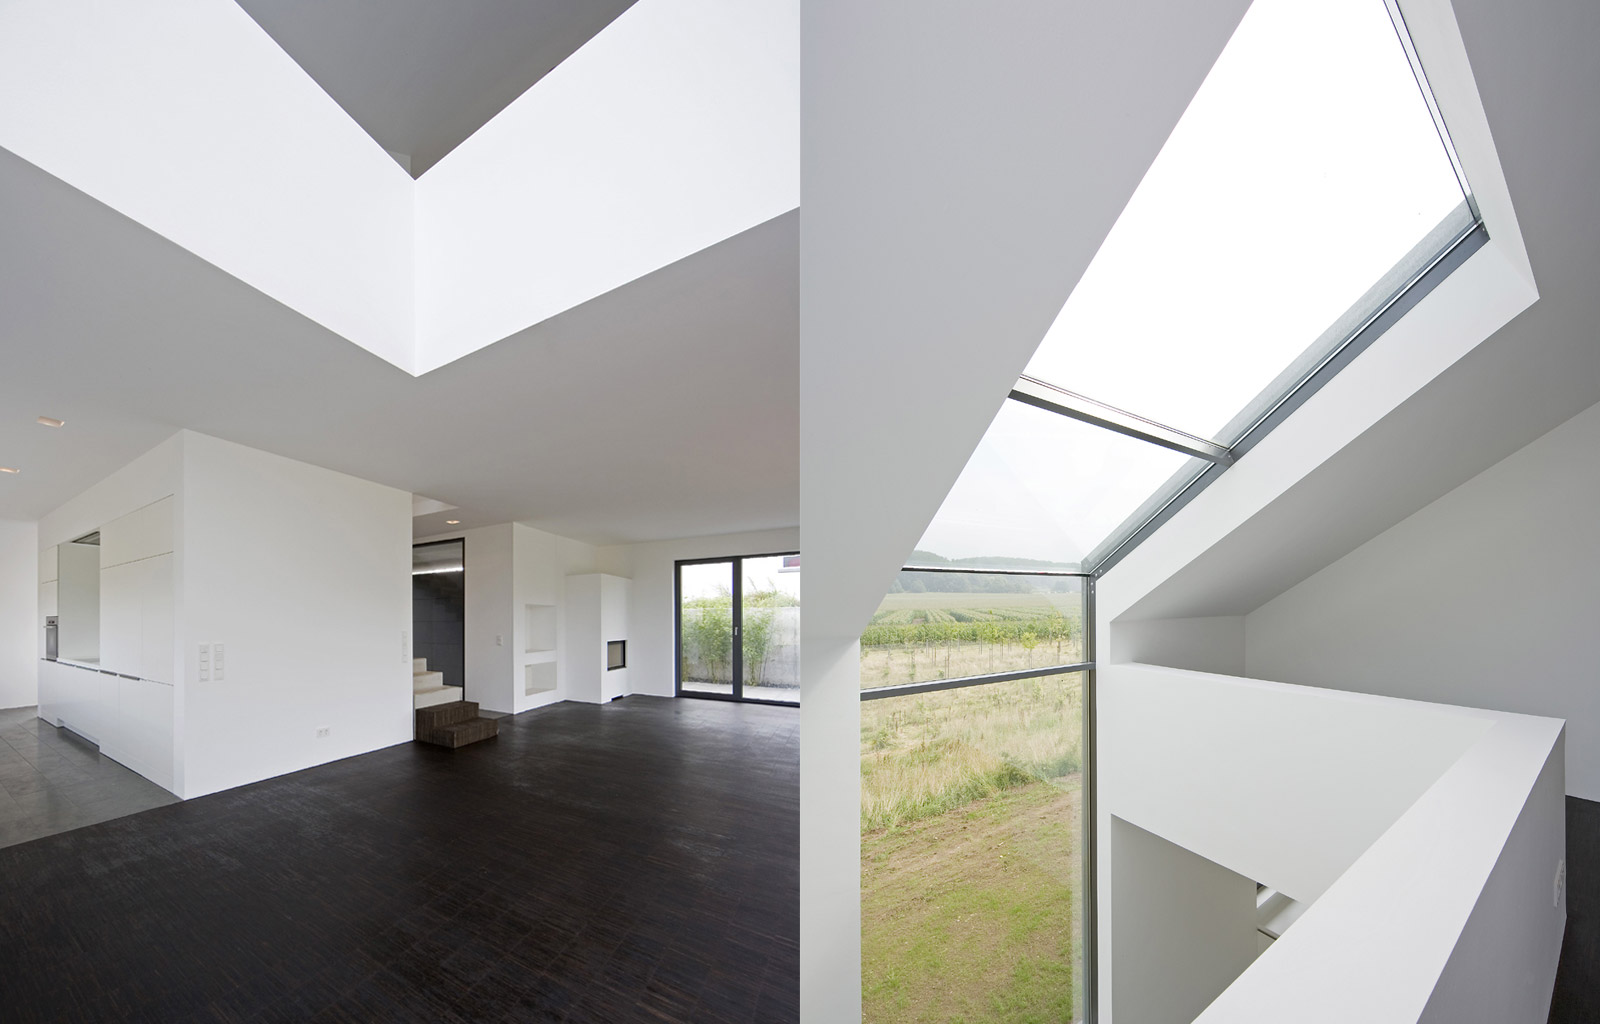 haus f bergisch gladbach hpa architektur. Black Bedroom Furniture Sets. Home Design Ideas